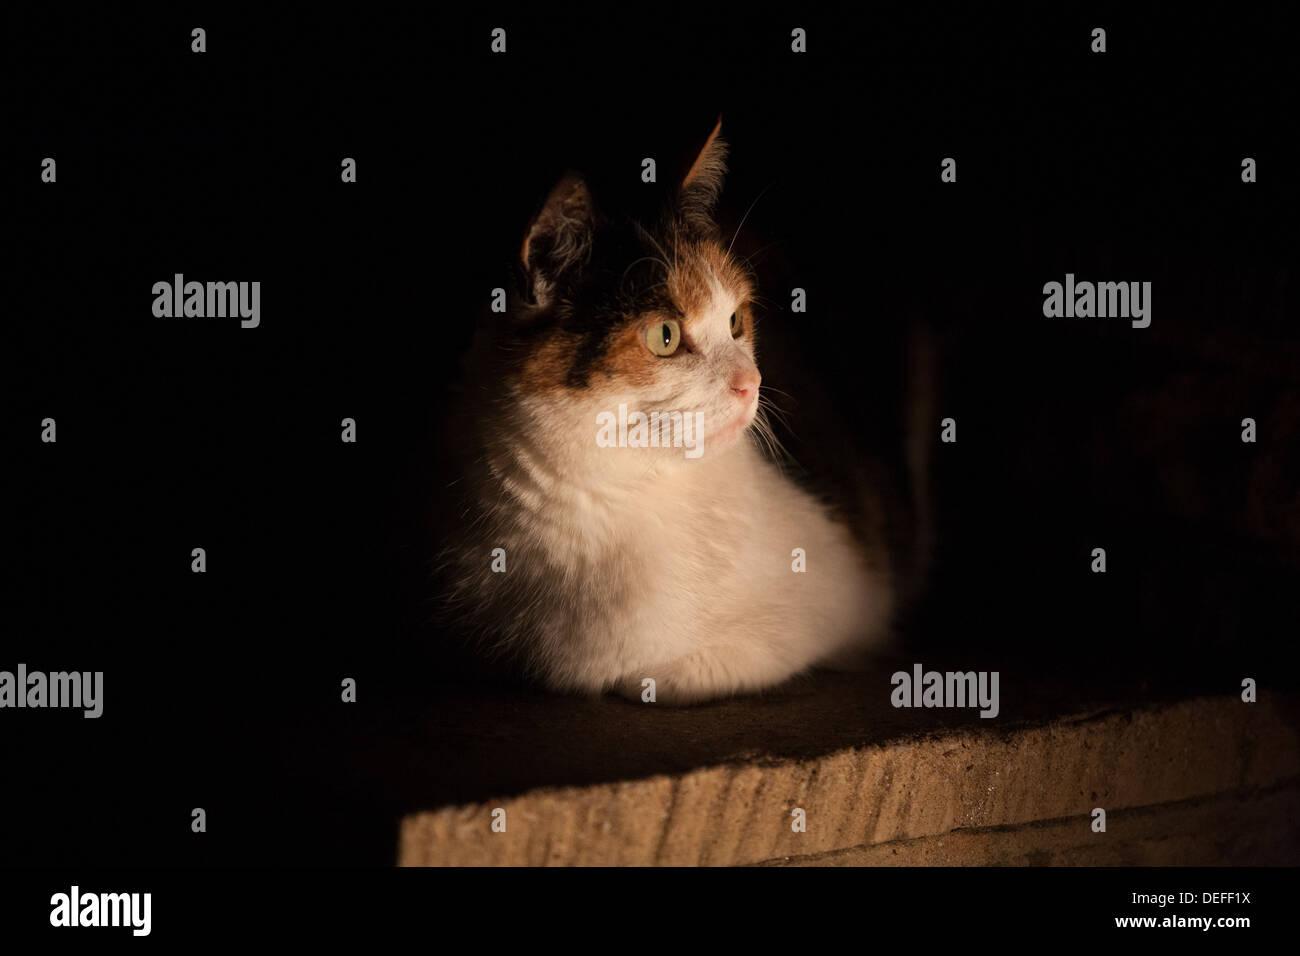 Tortoiseshell domestic shorthaired Cat at night - Stock Image